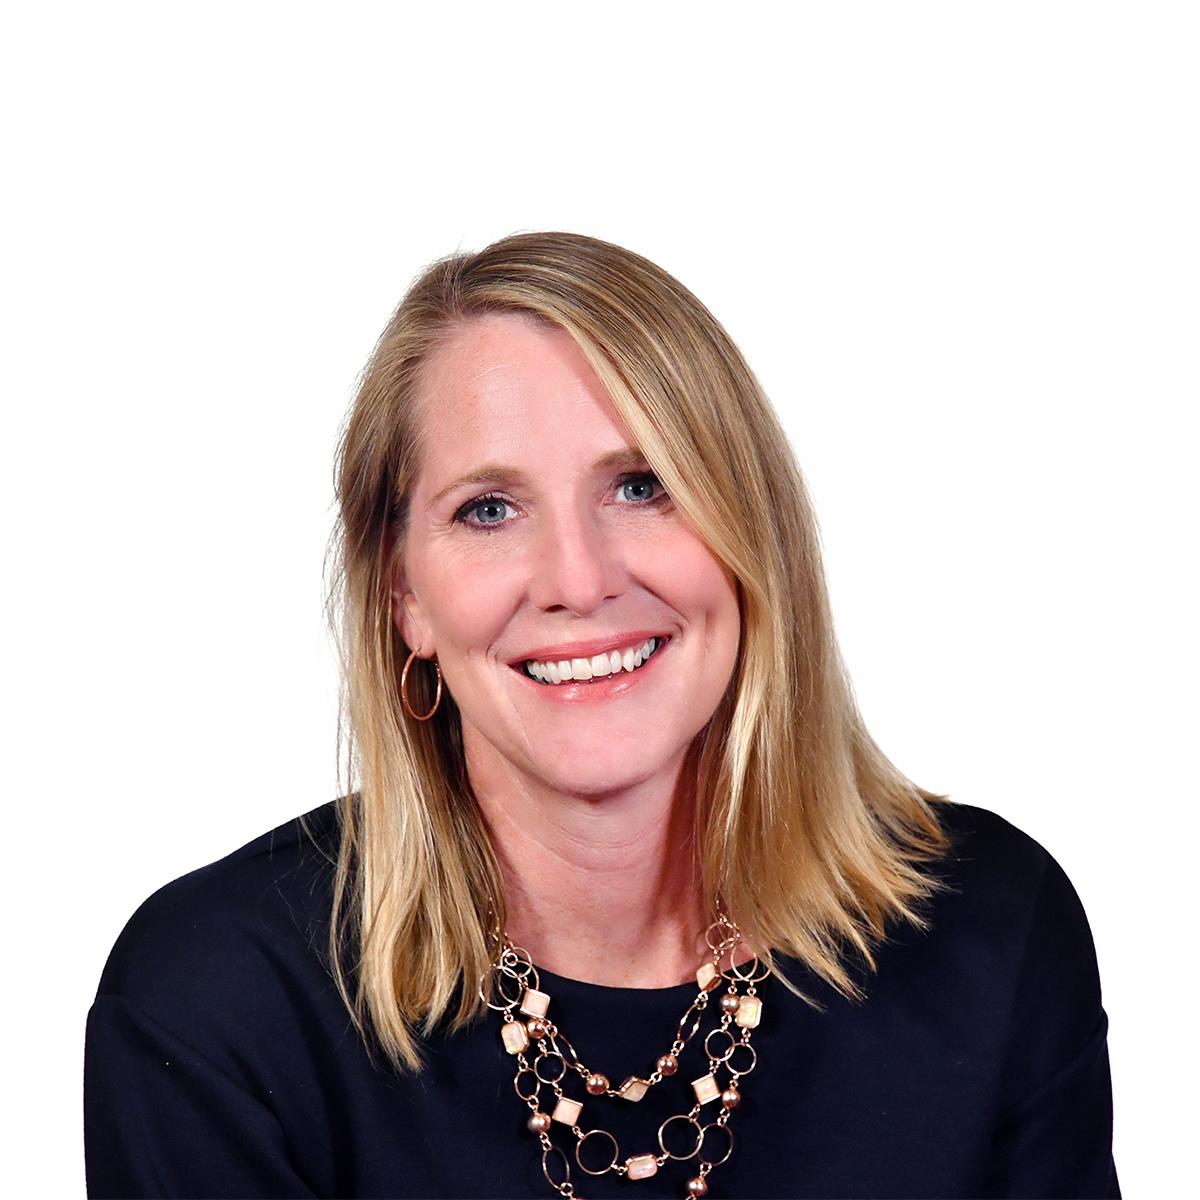 Kathy Lesner VP Client Director at MetrixLab